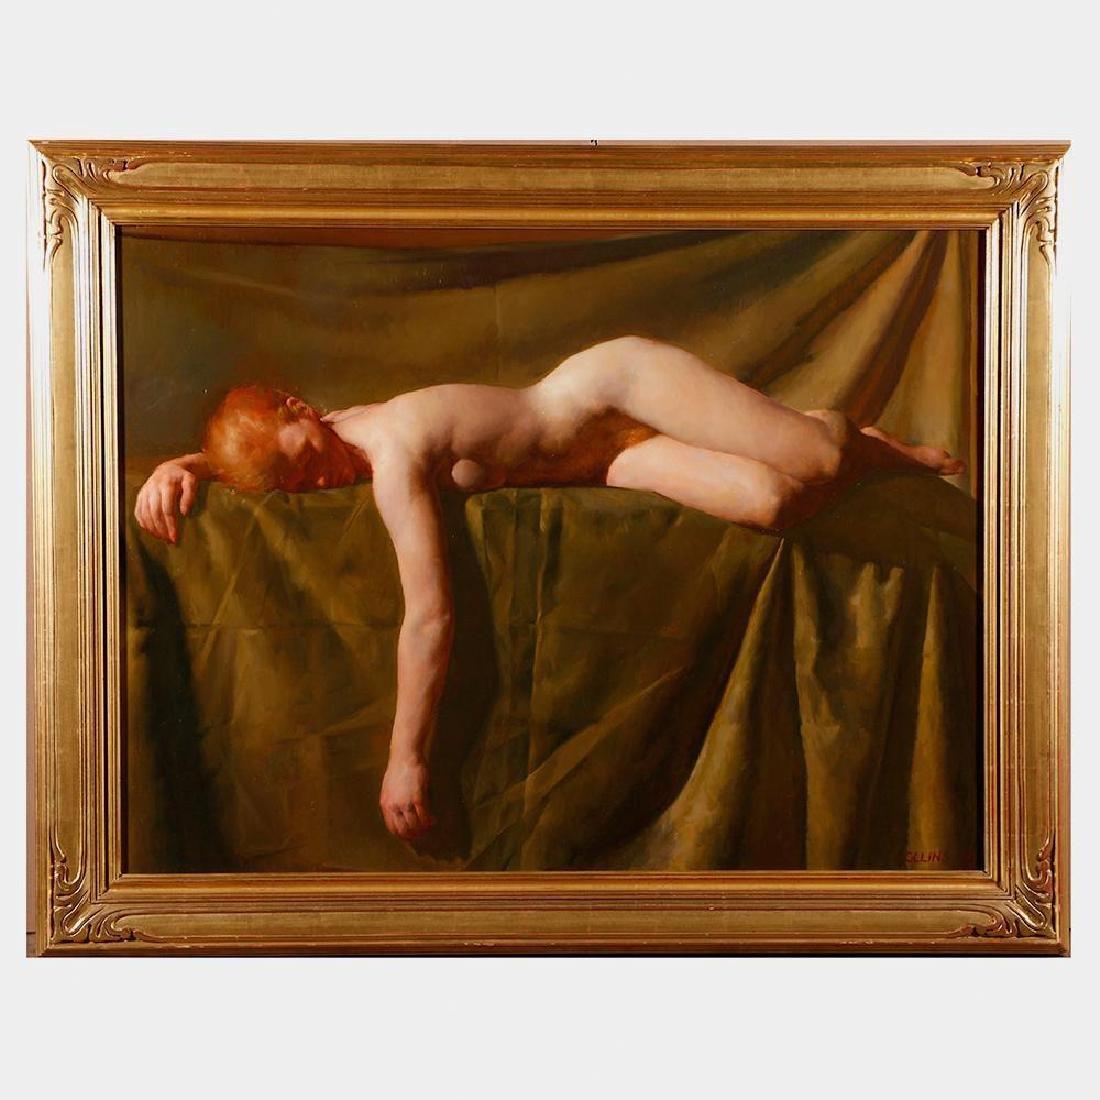 Jacob Collins (born 1964)